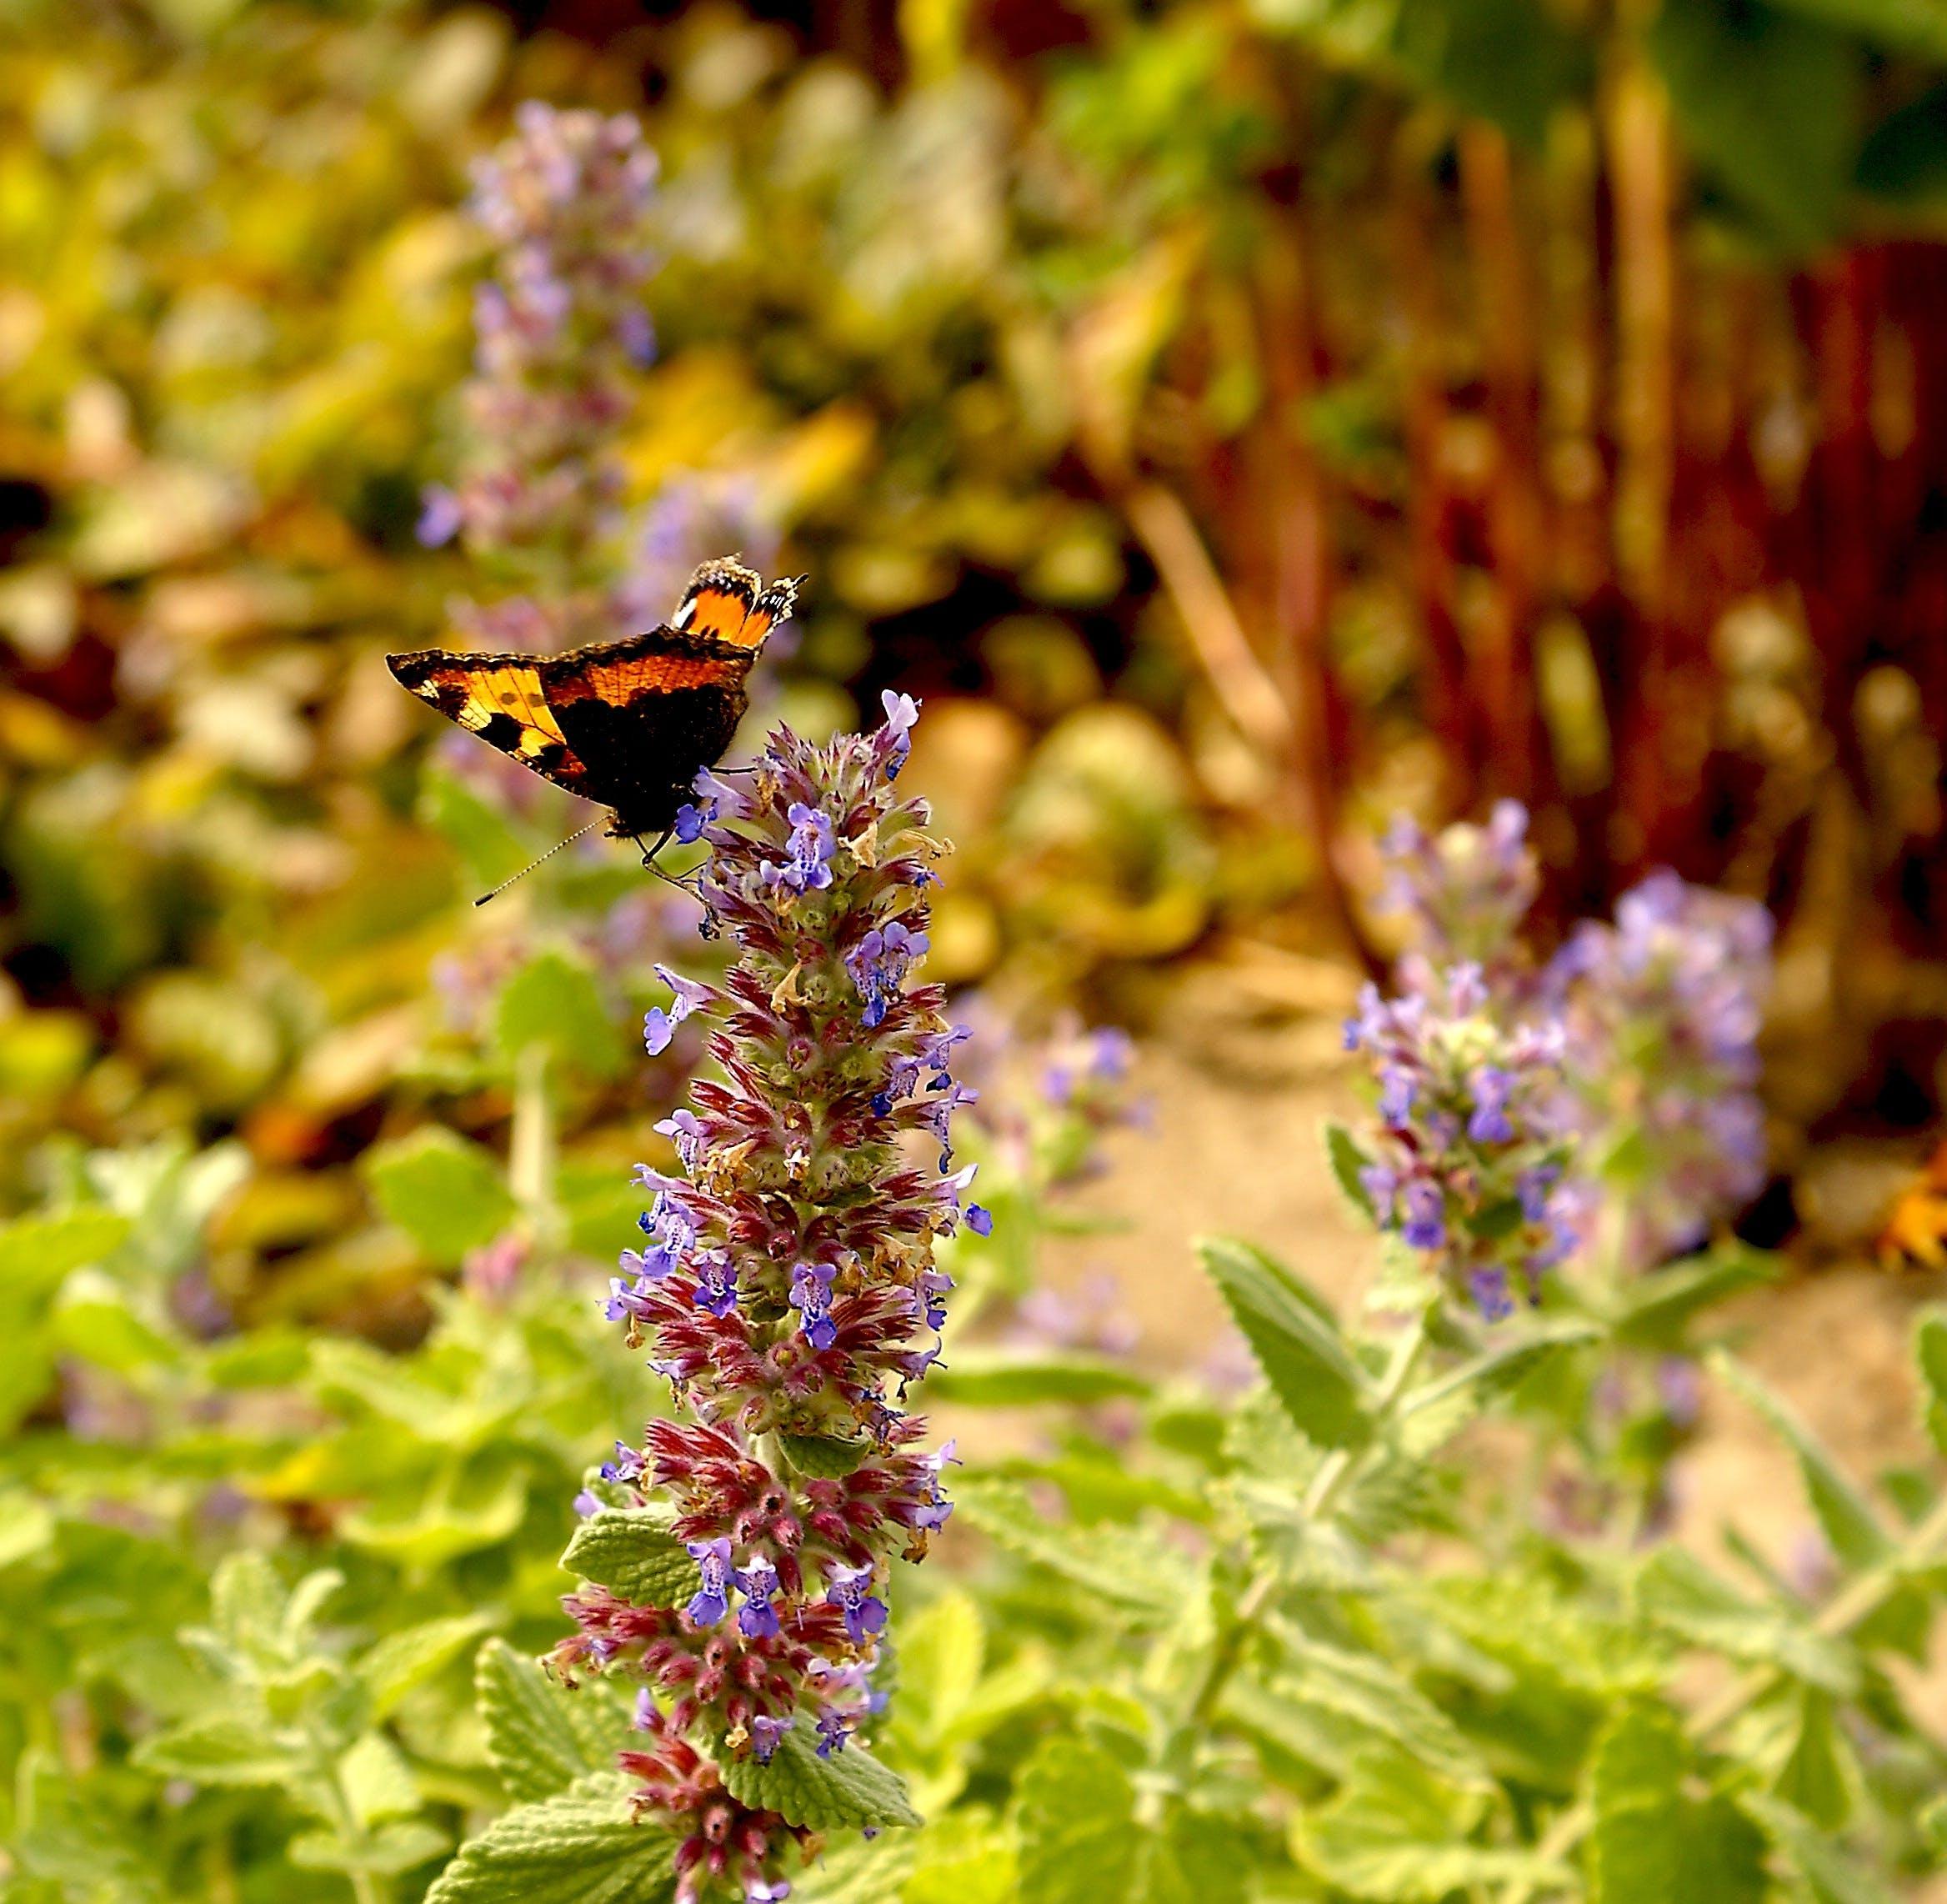 Free stock photo of nature, sunny, summer, garden